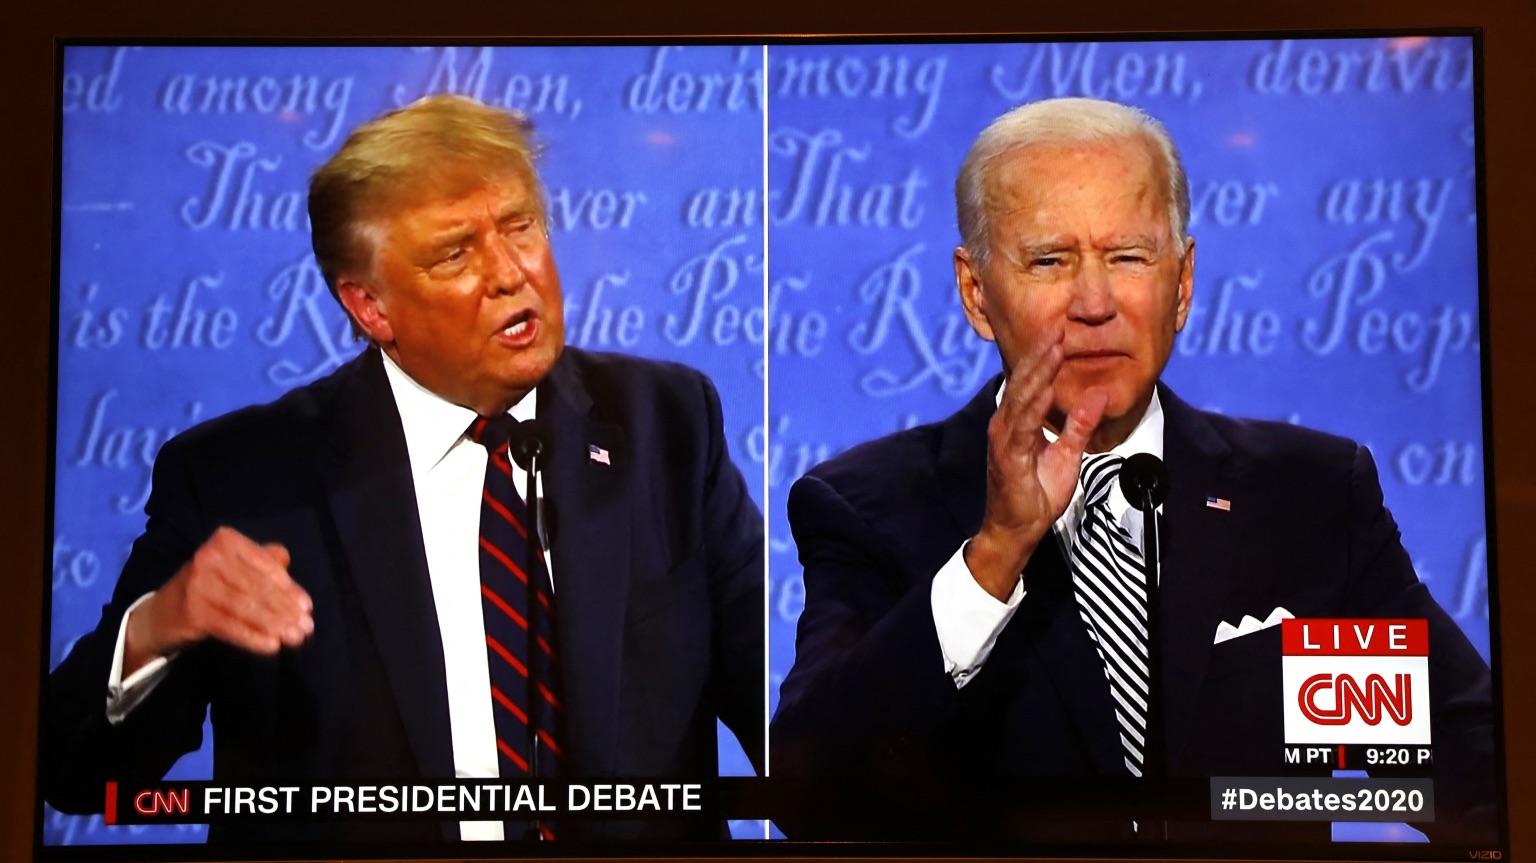 Trump and Biden brawl in chaotic first debate